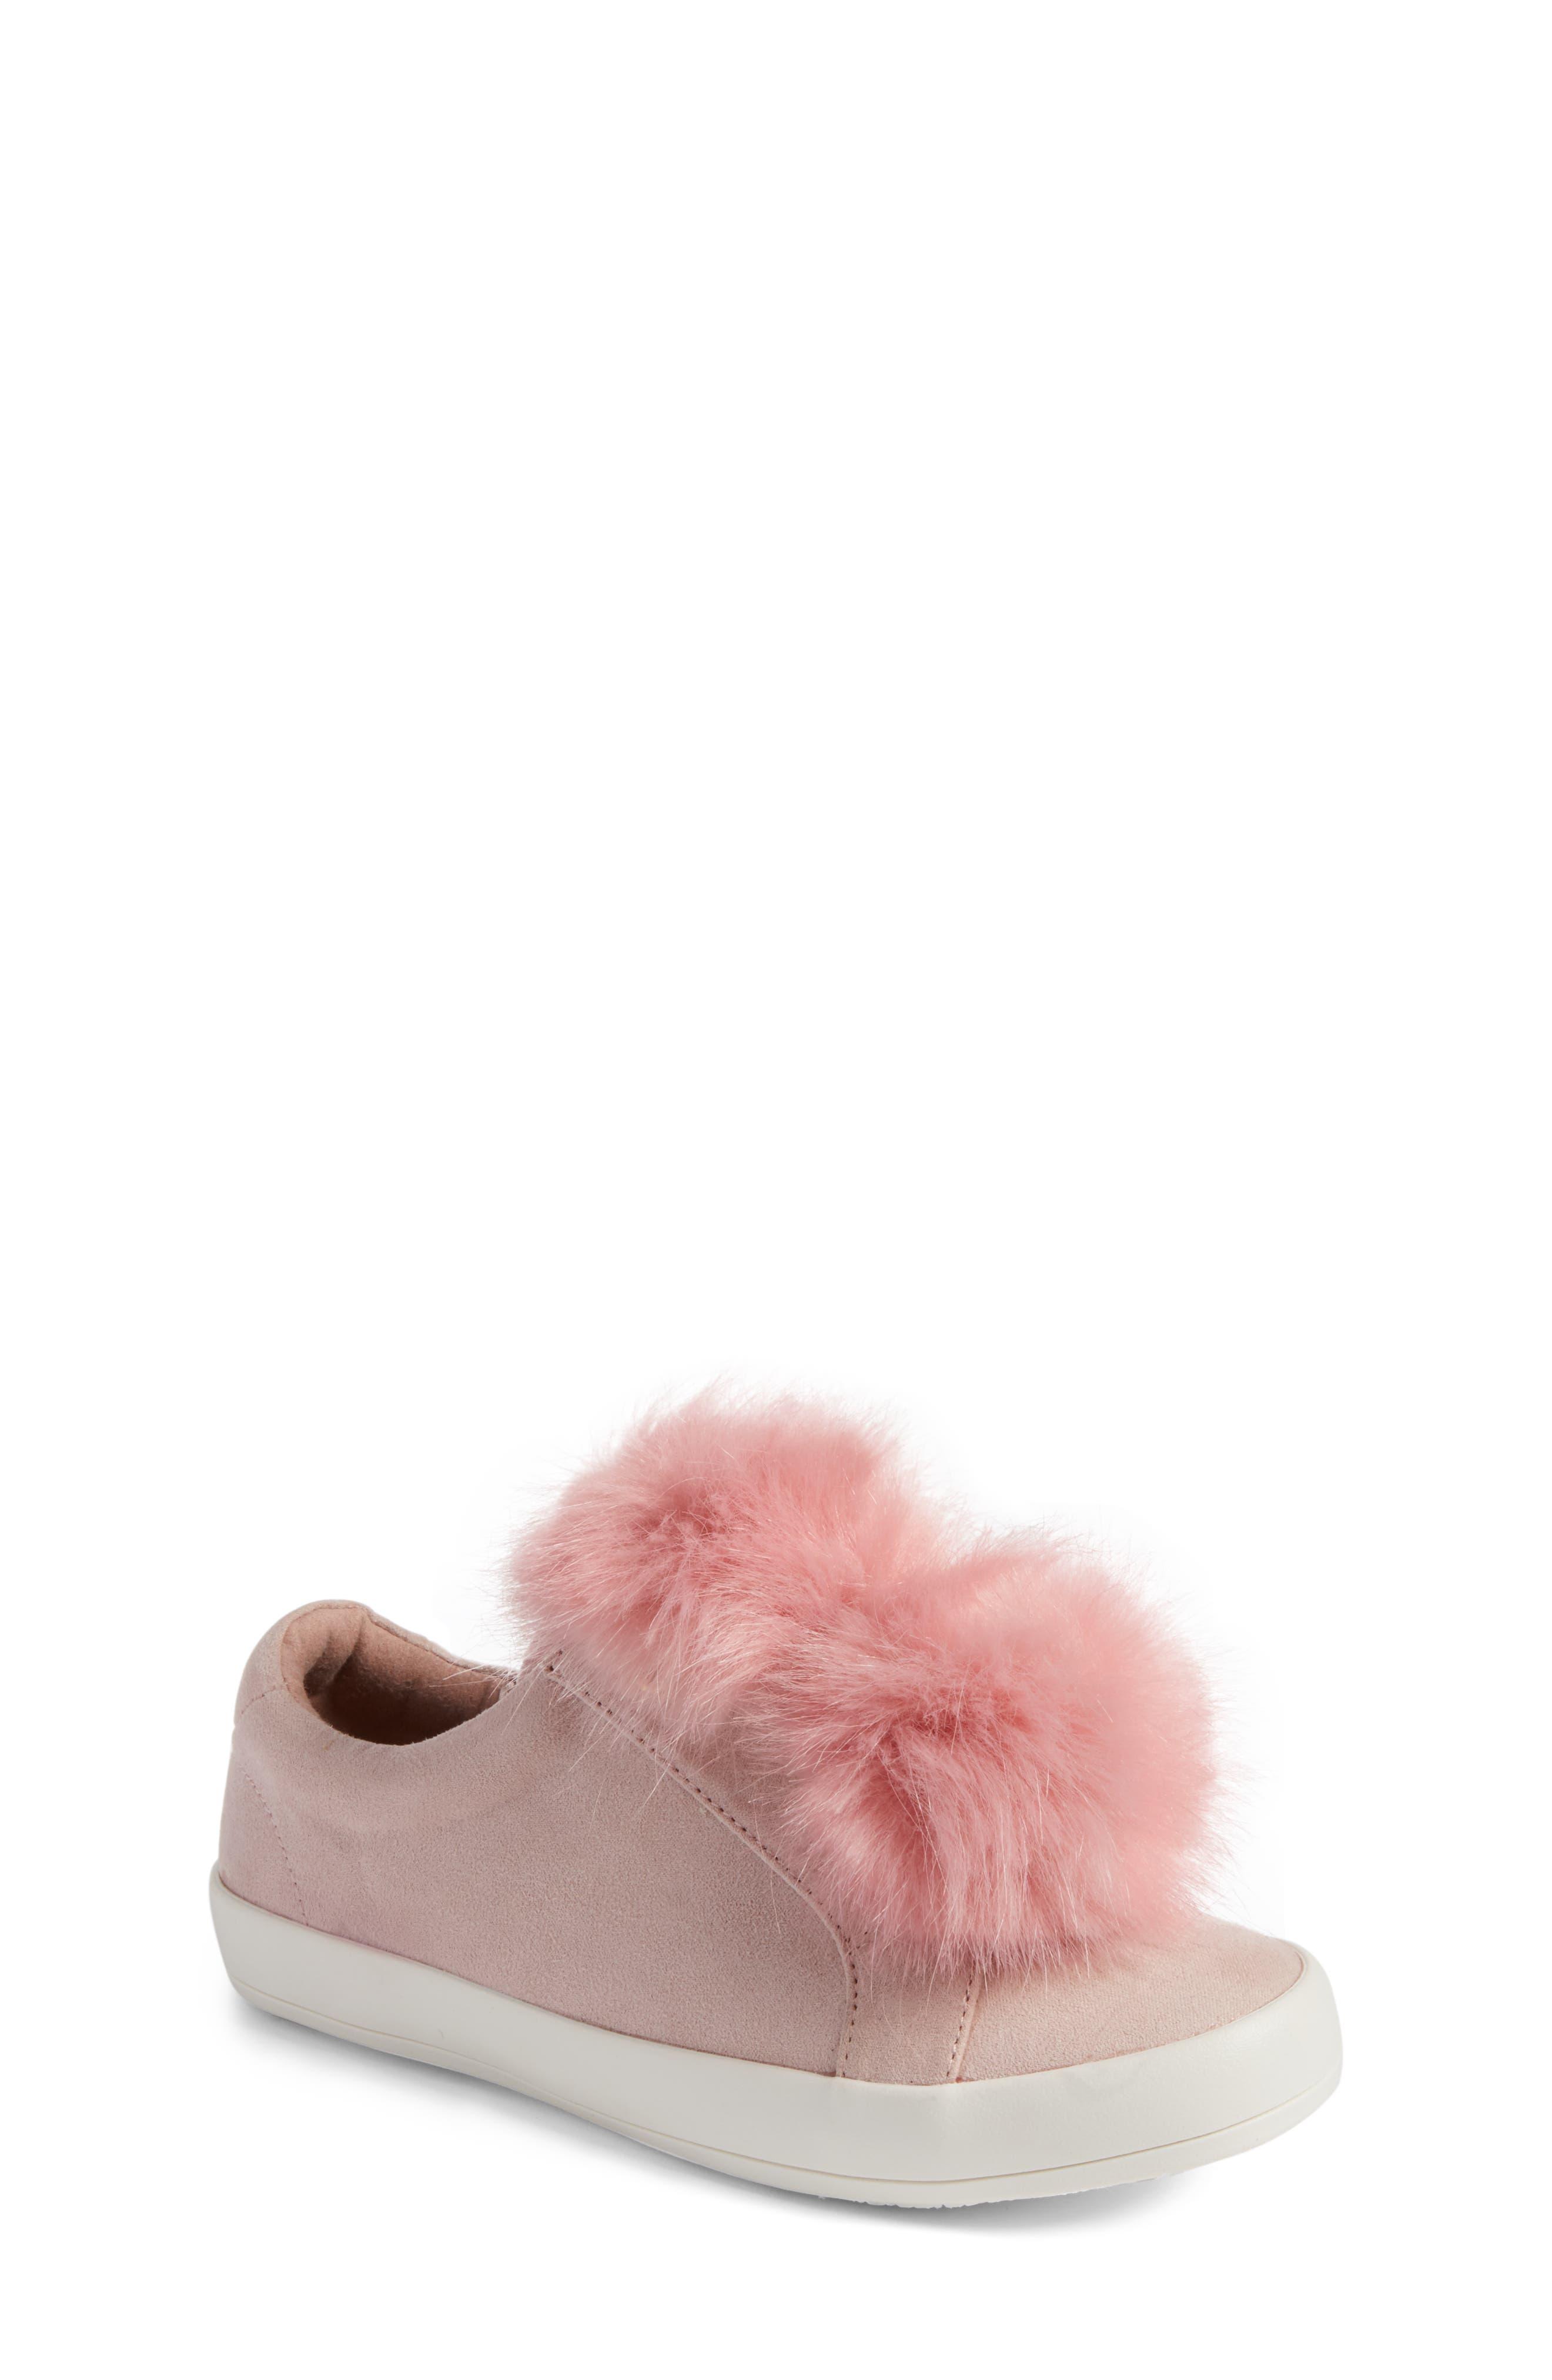 SAM EDELMAN Cynthia Leya Faux Fur Pompom Slip-On Sneaker